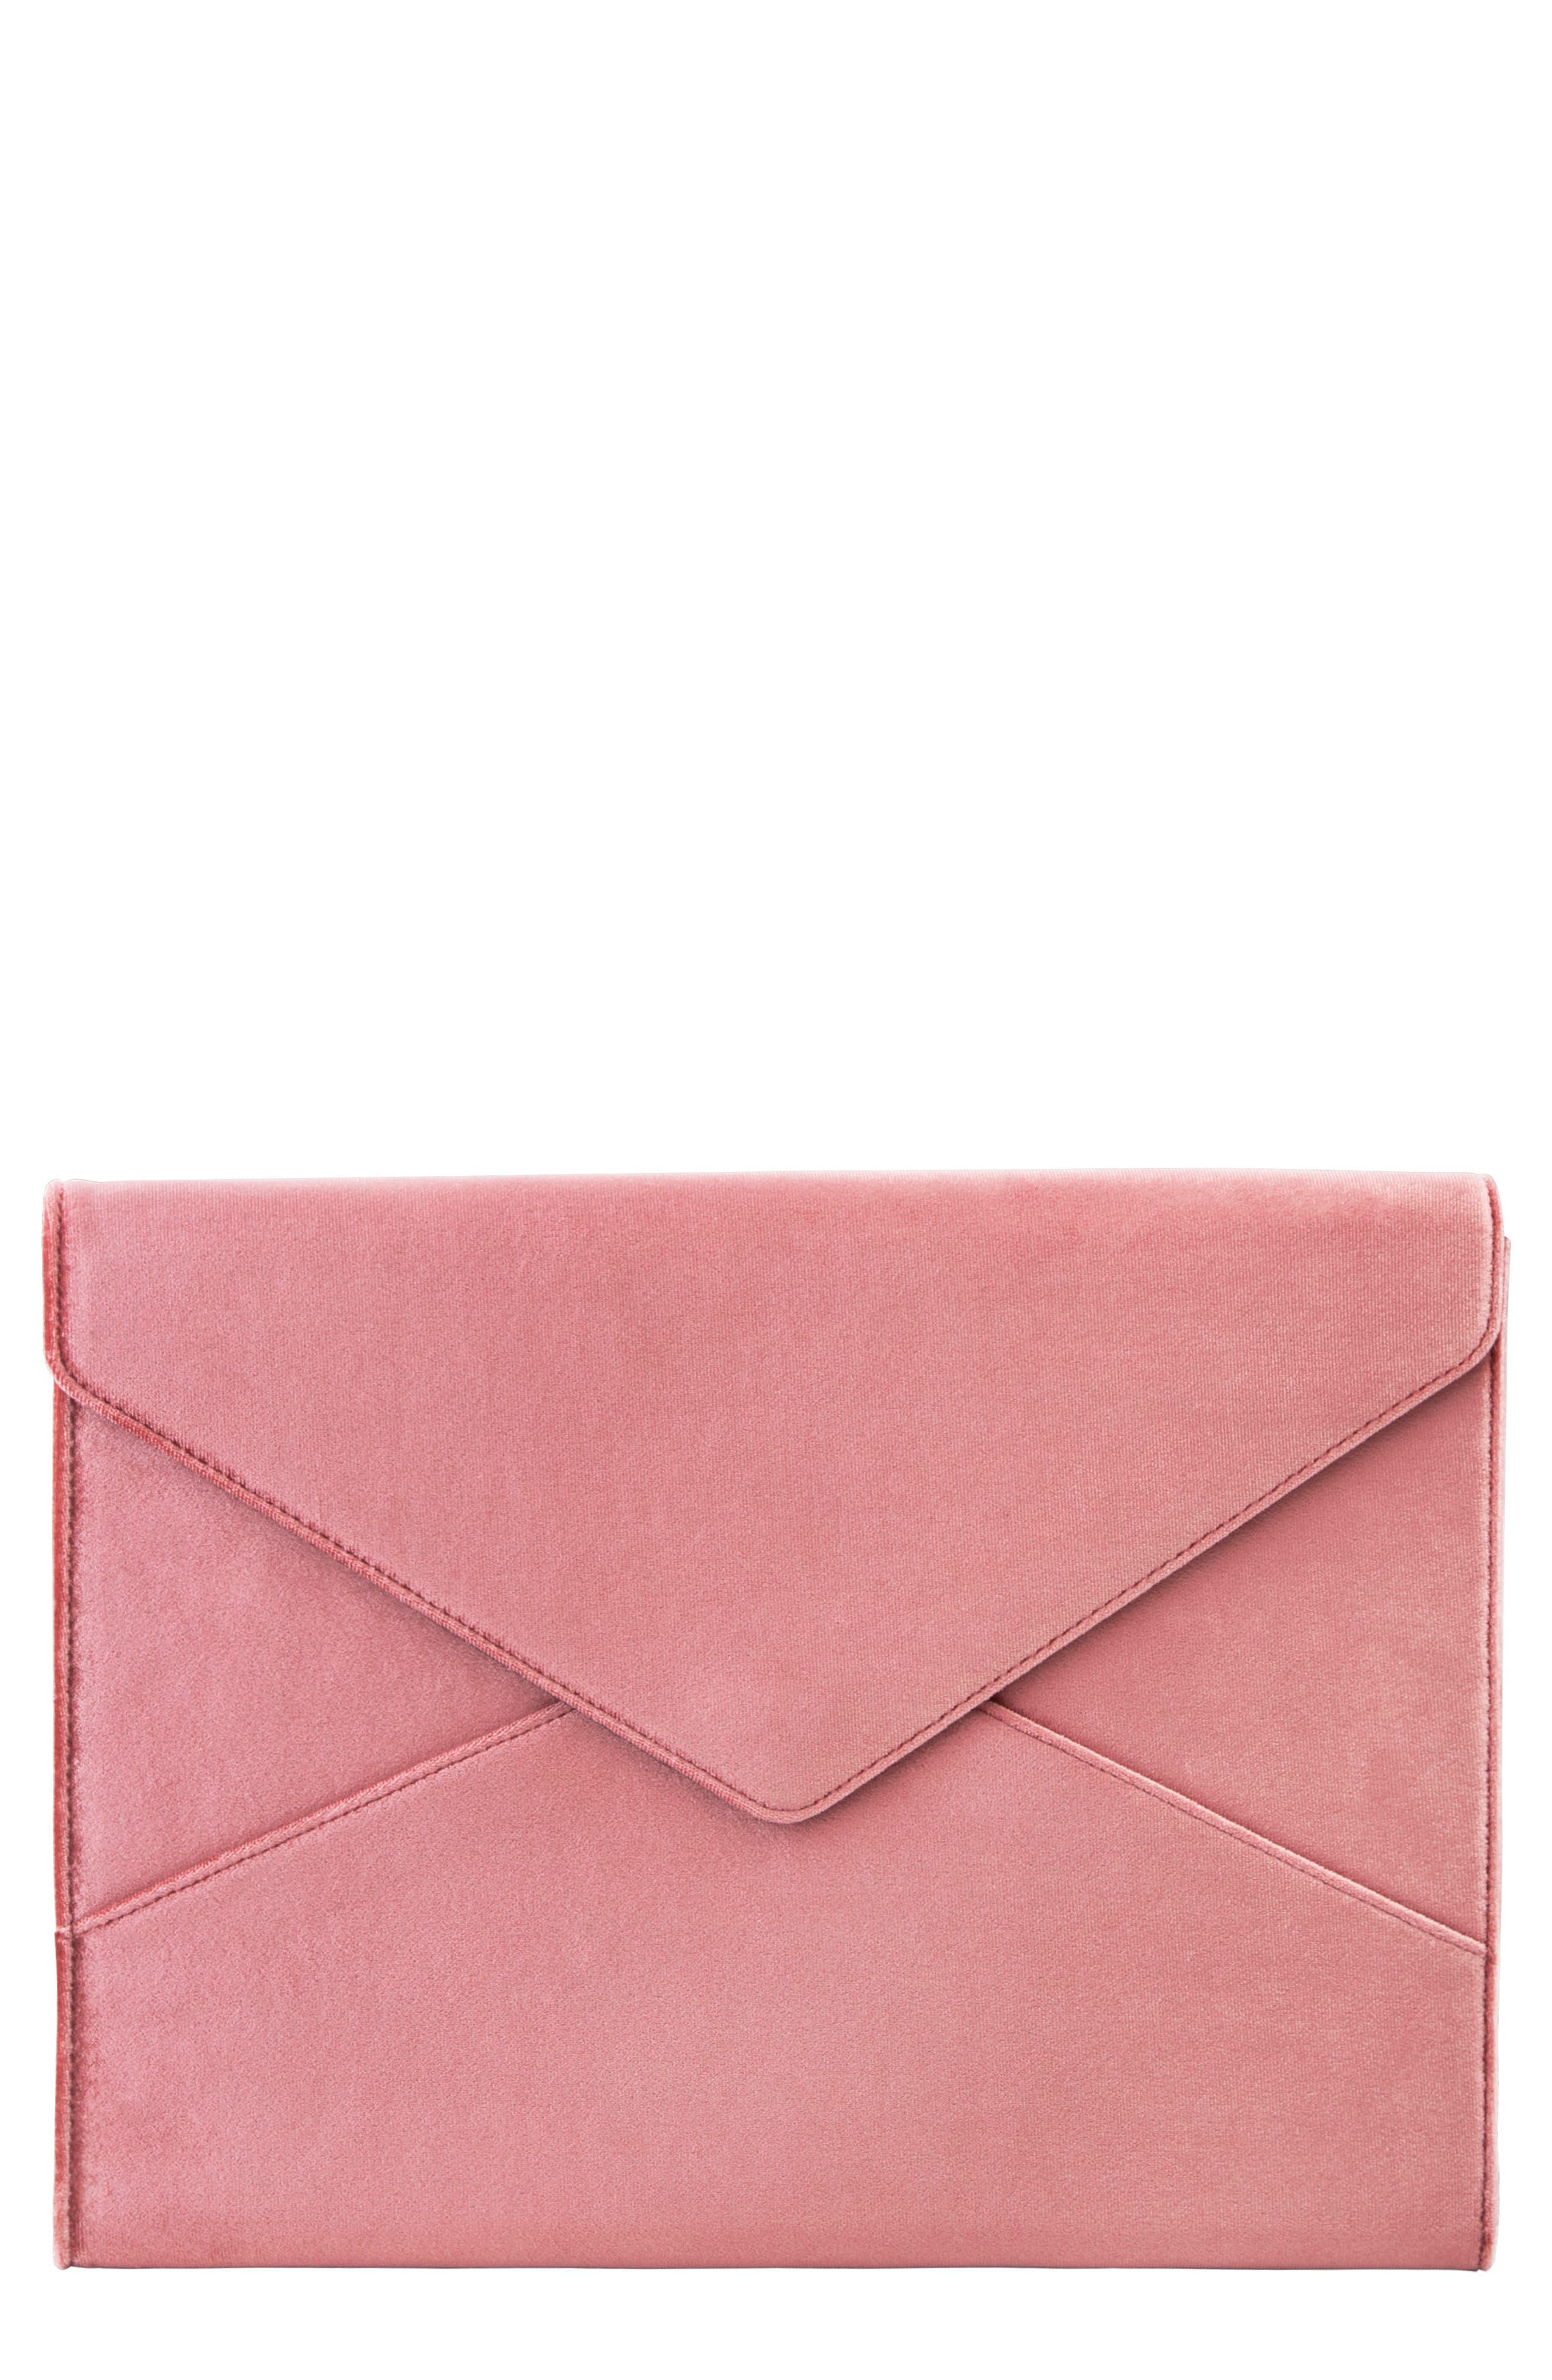 Rose Velvet Laptop Clutch,                         Main,                         color, 650